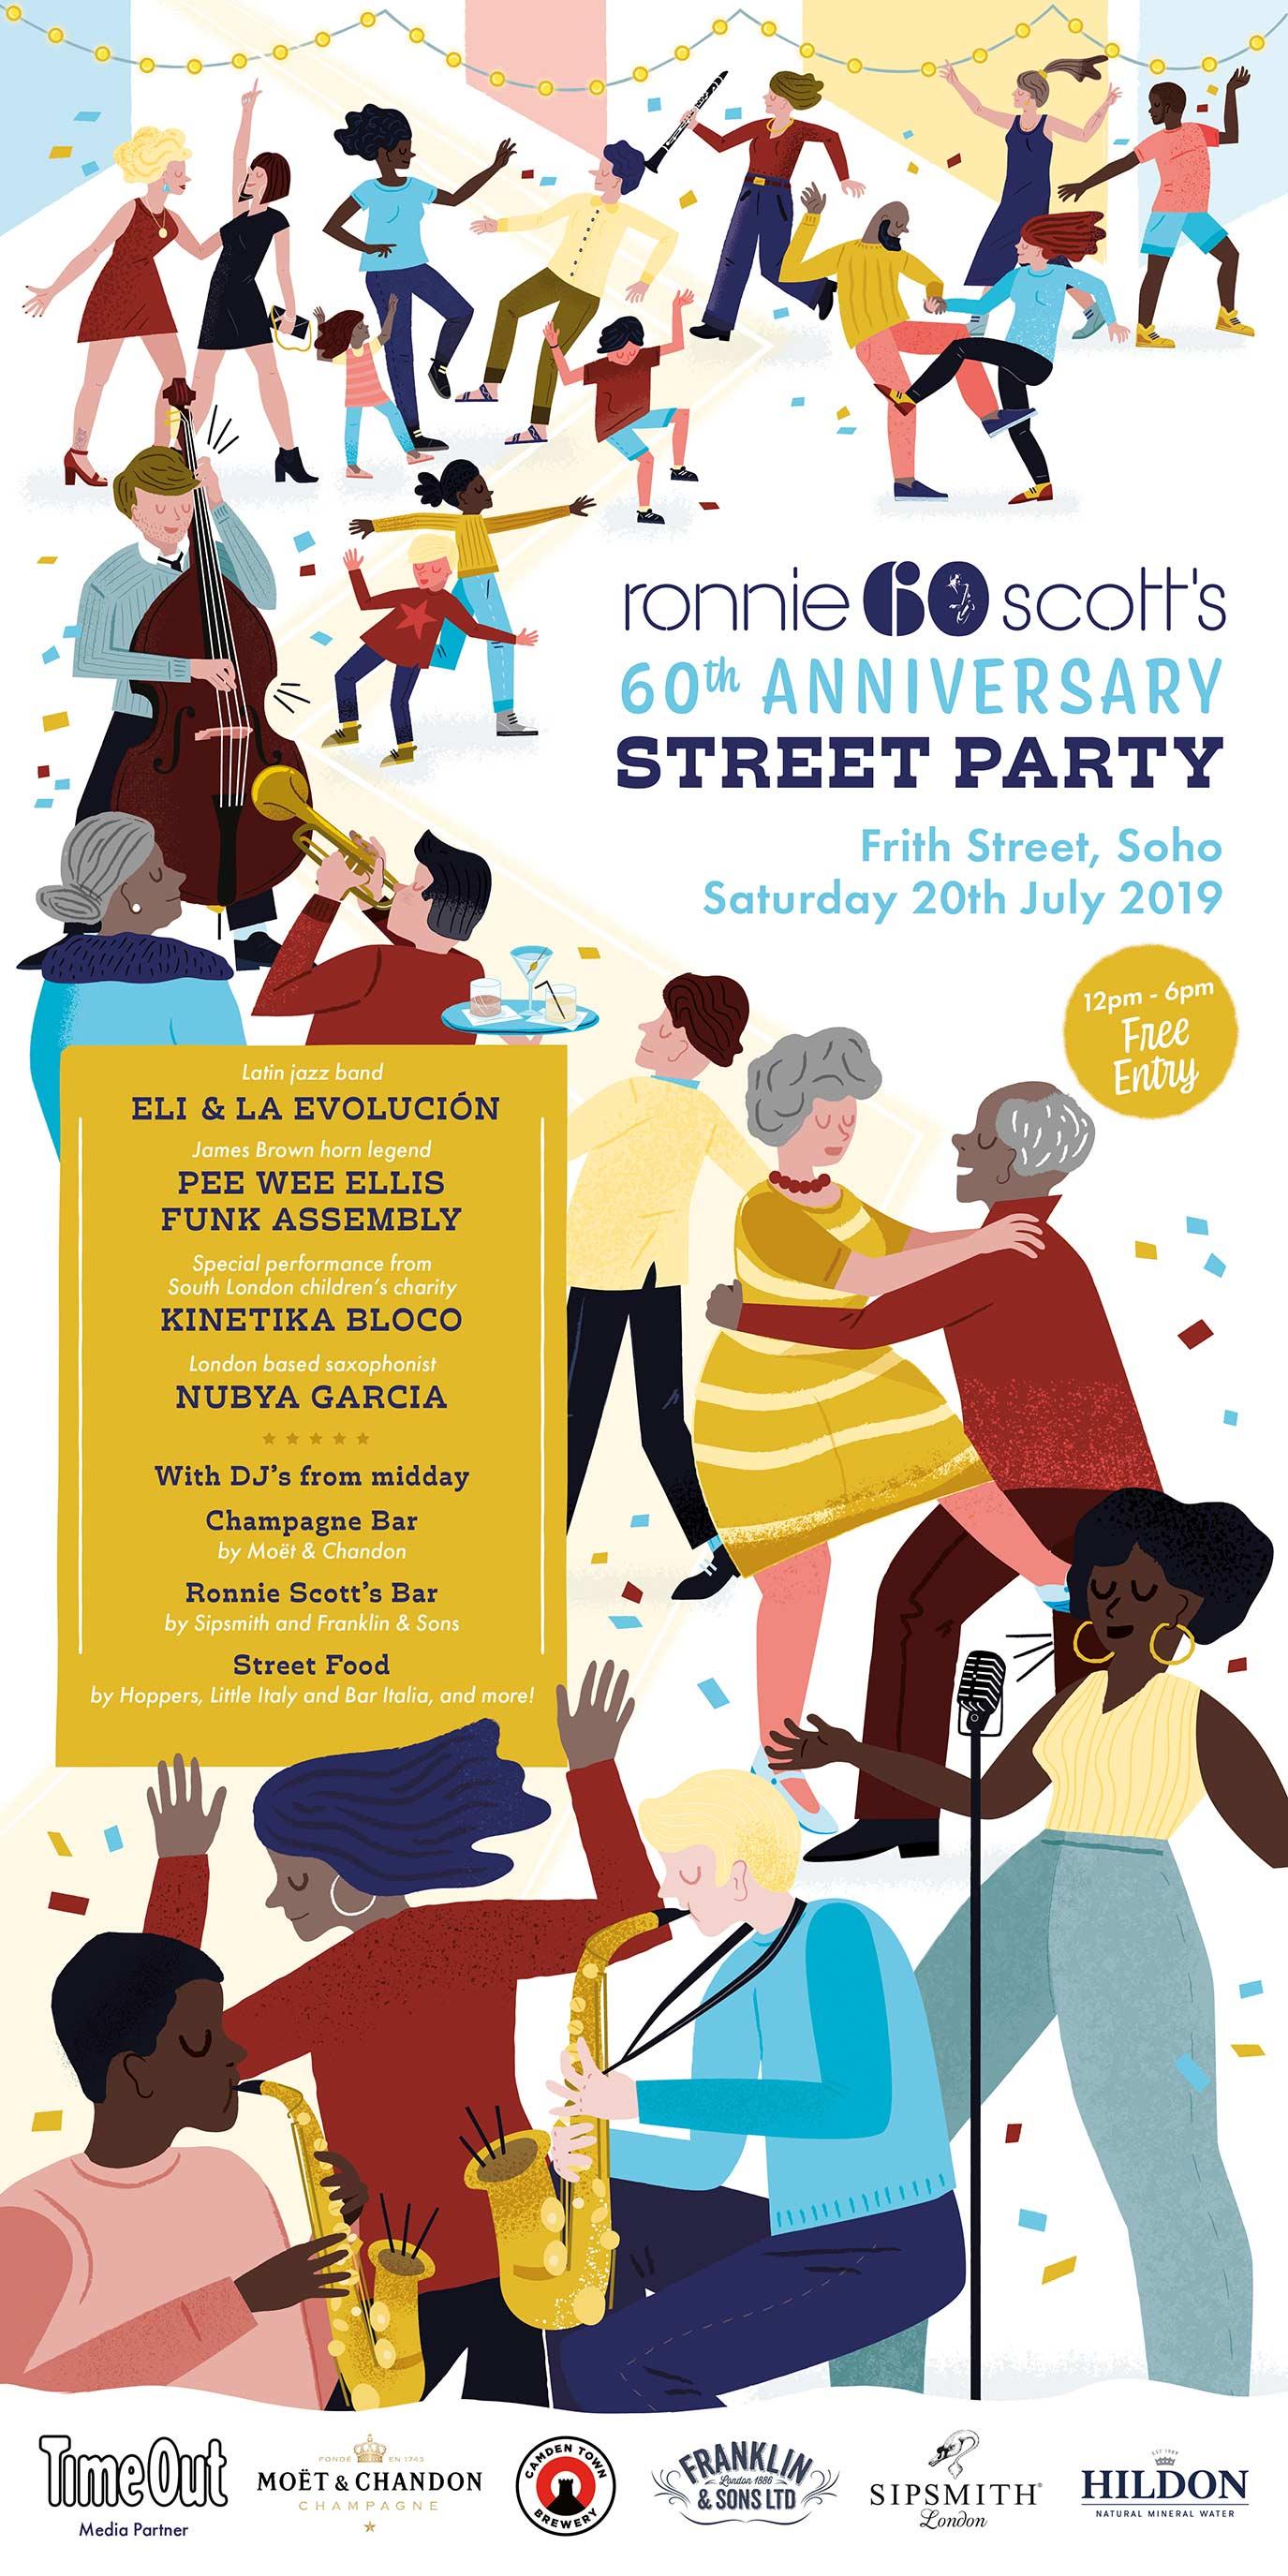 Ronnie Scott's Jazz Club 60th Anniversary Street Party portfolio cover image